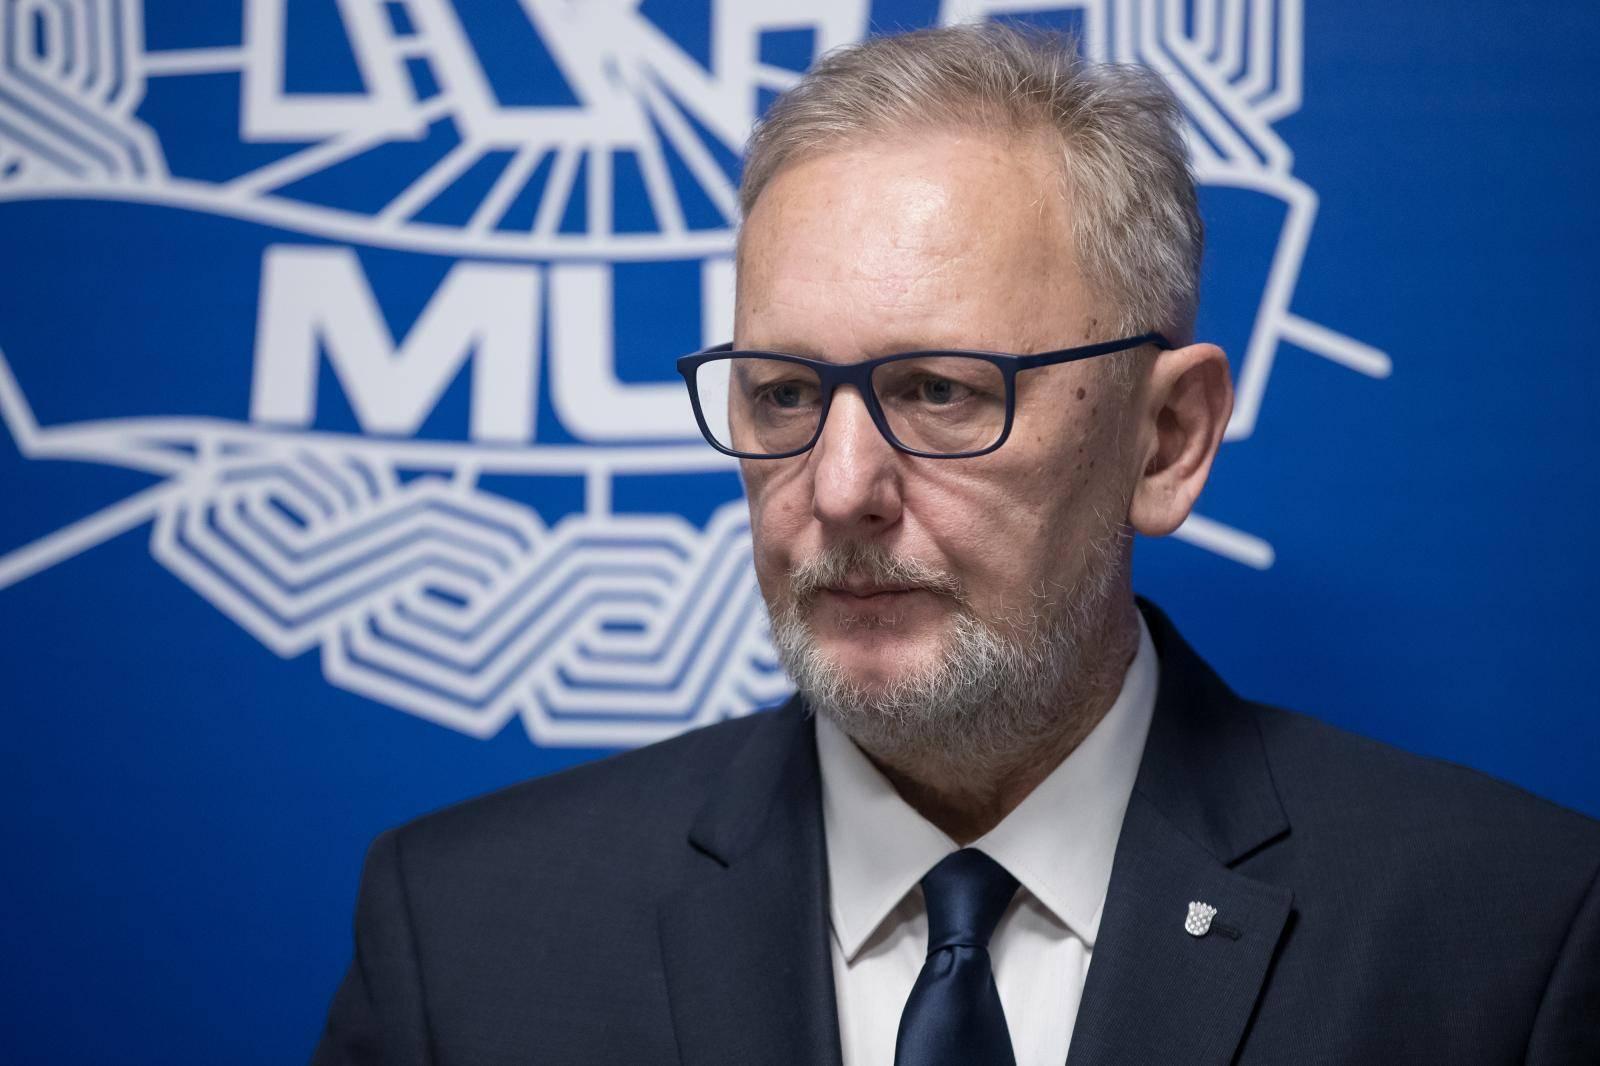 Zagreb: Izjava ministra Božinovića nakon sastanka s Gillesom de Kerchovom